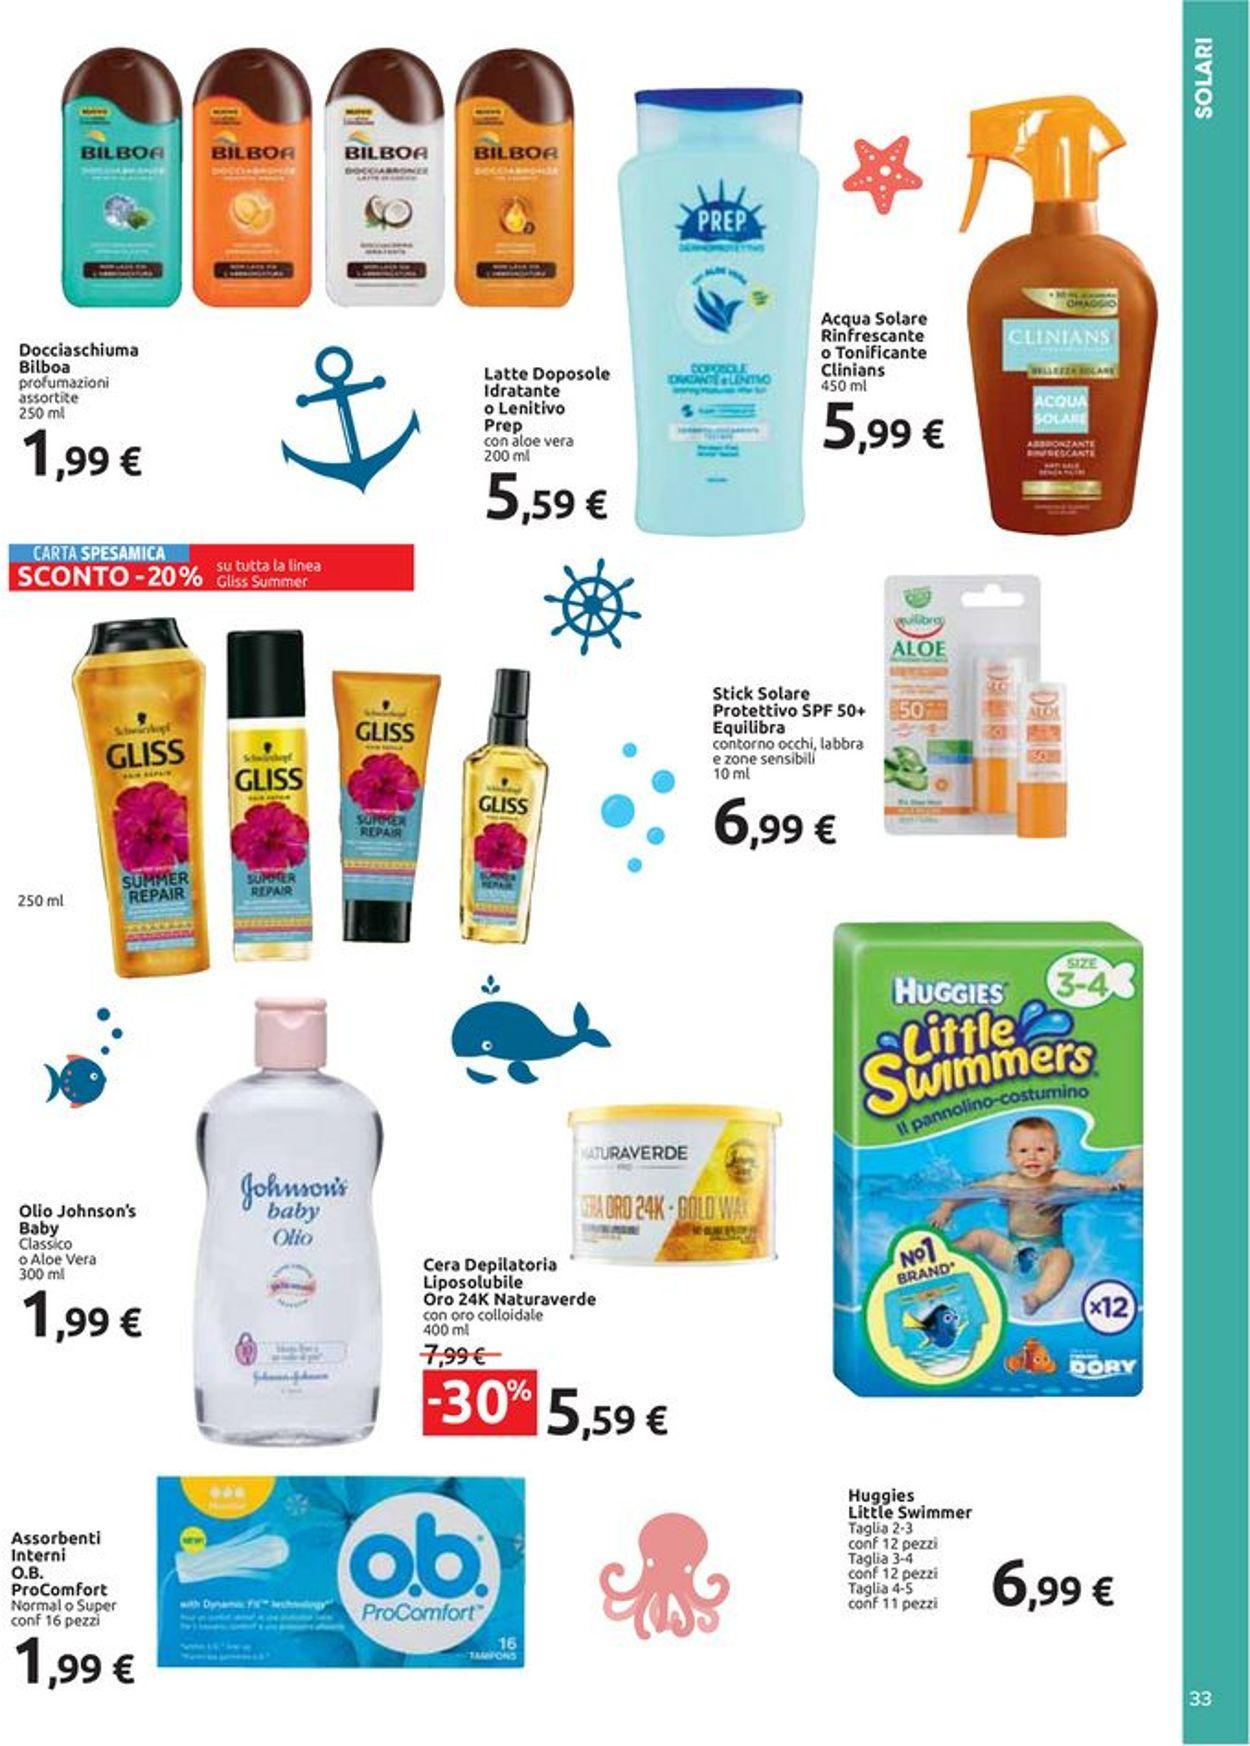 Volantino Carrefour - Offerte 20/05-27/05/2021 (Pagina 33)